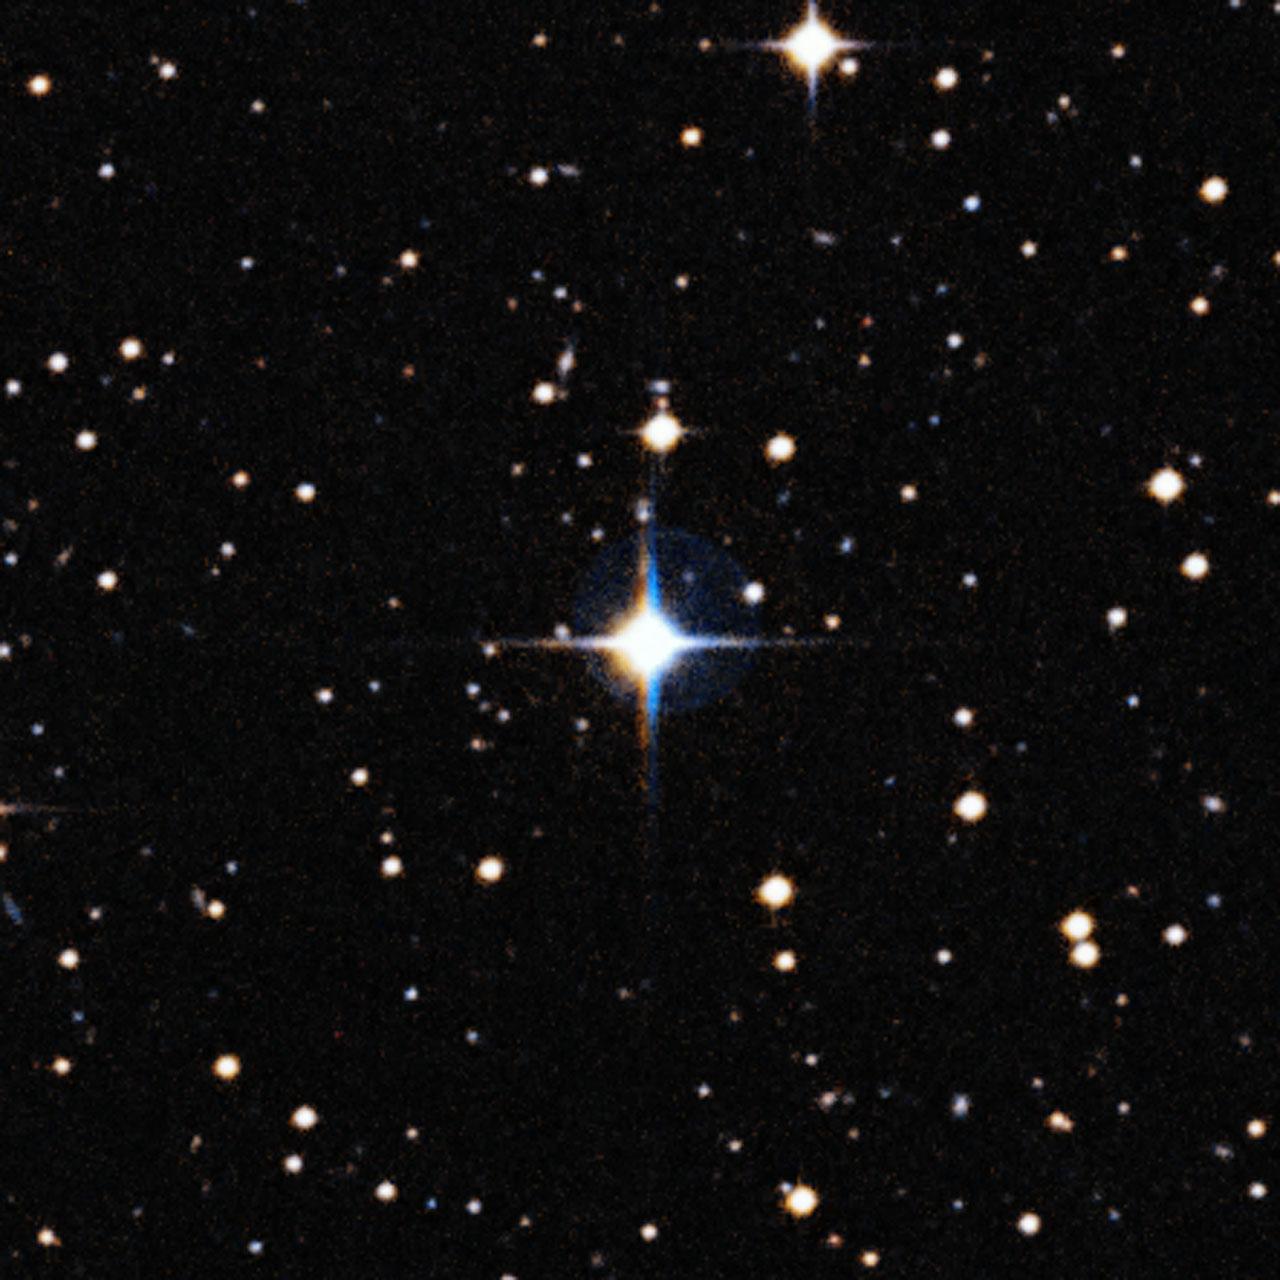 Image de HIP 102152